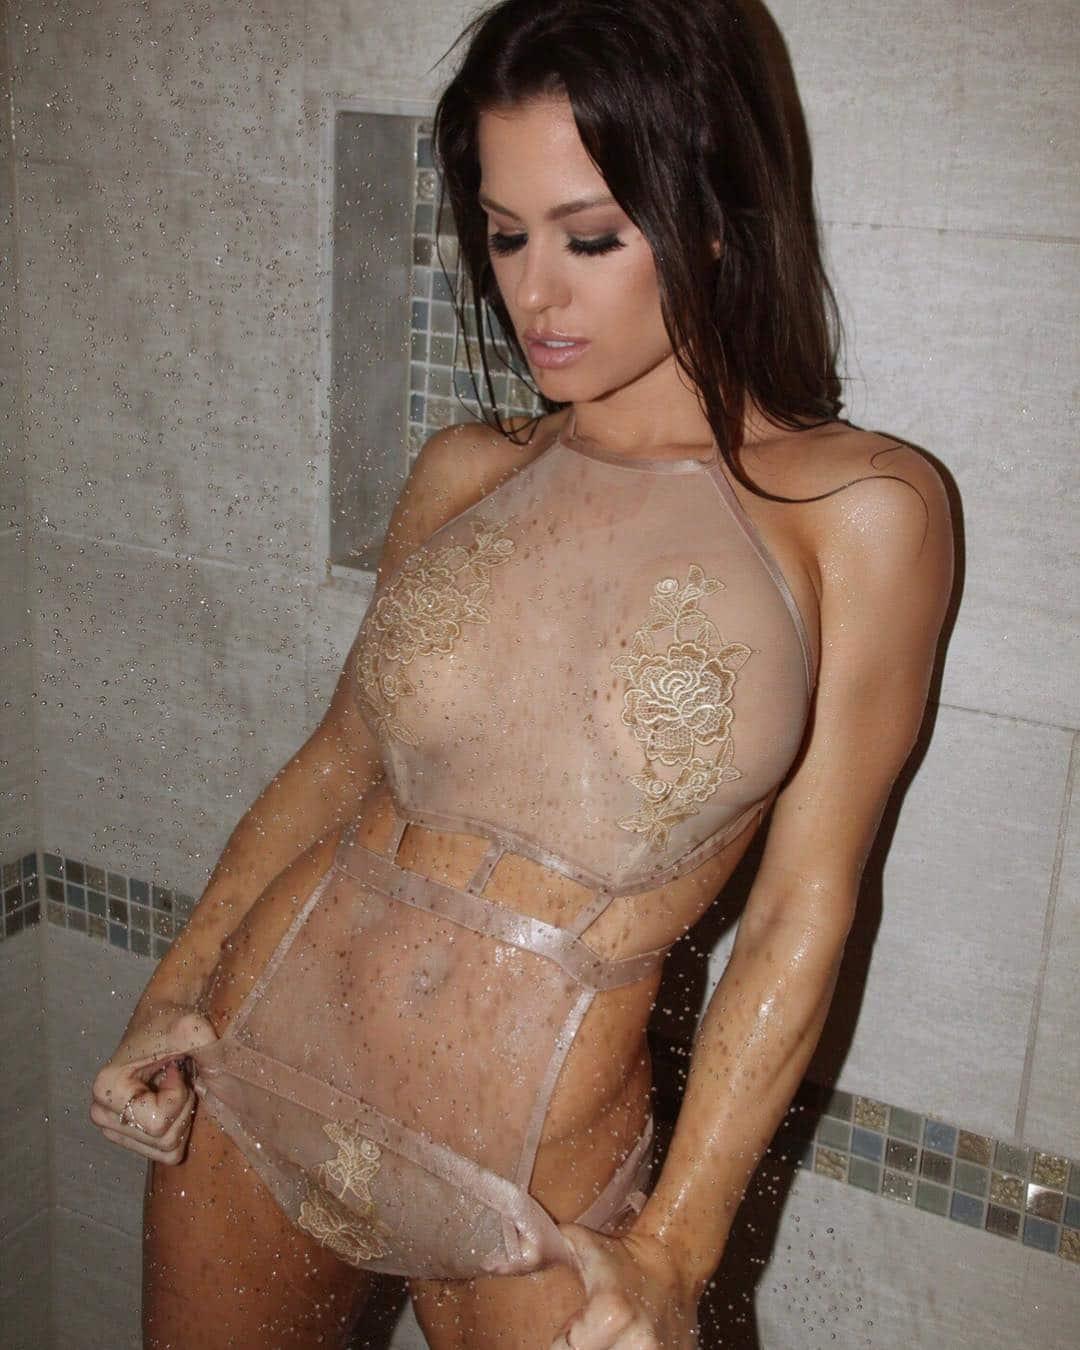 Brooke Lee Adams Free Pics Videos Biography